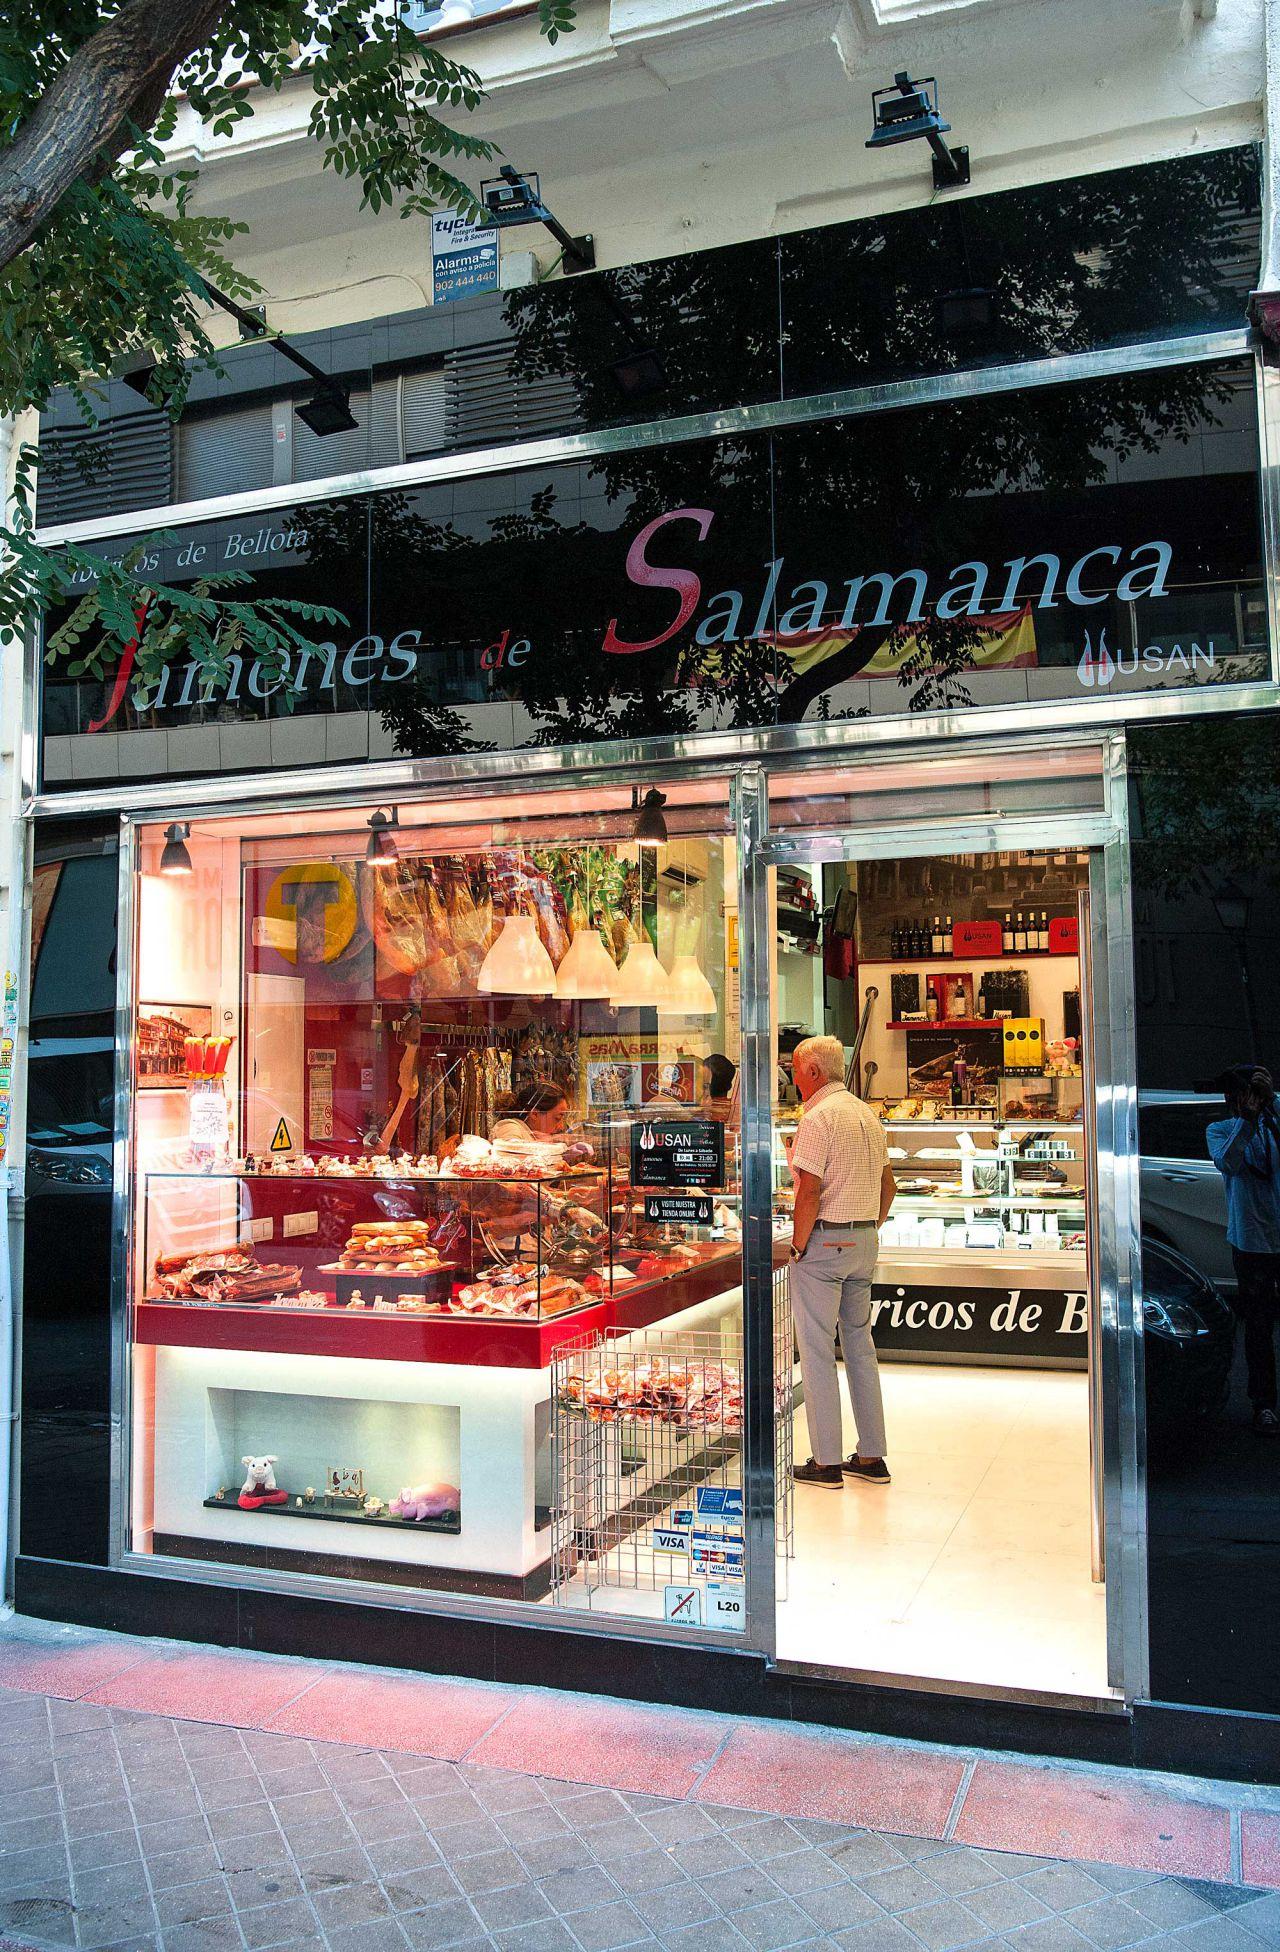 Nº 13. jamones husan   Tlf. 915 75 35 97 / jamoneshusan.com  (Princesa, 25 / Tlf. 915 47 80 54)